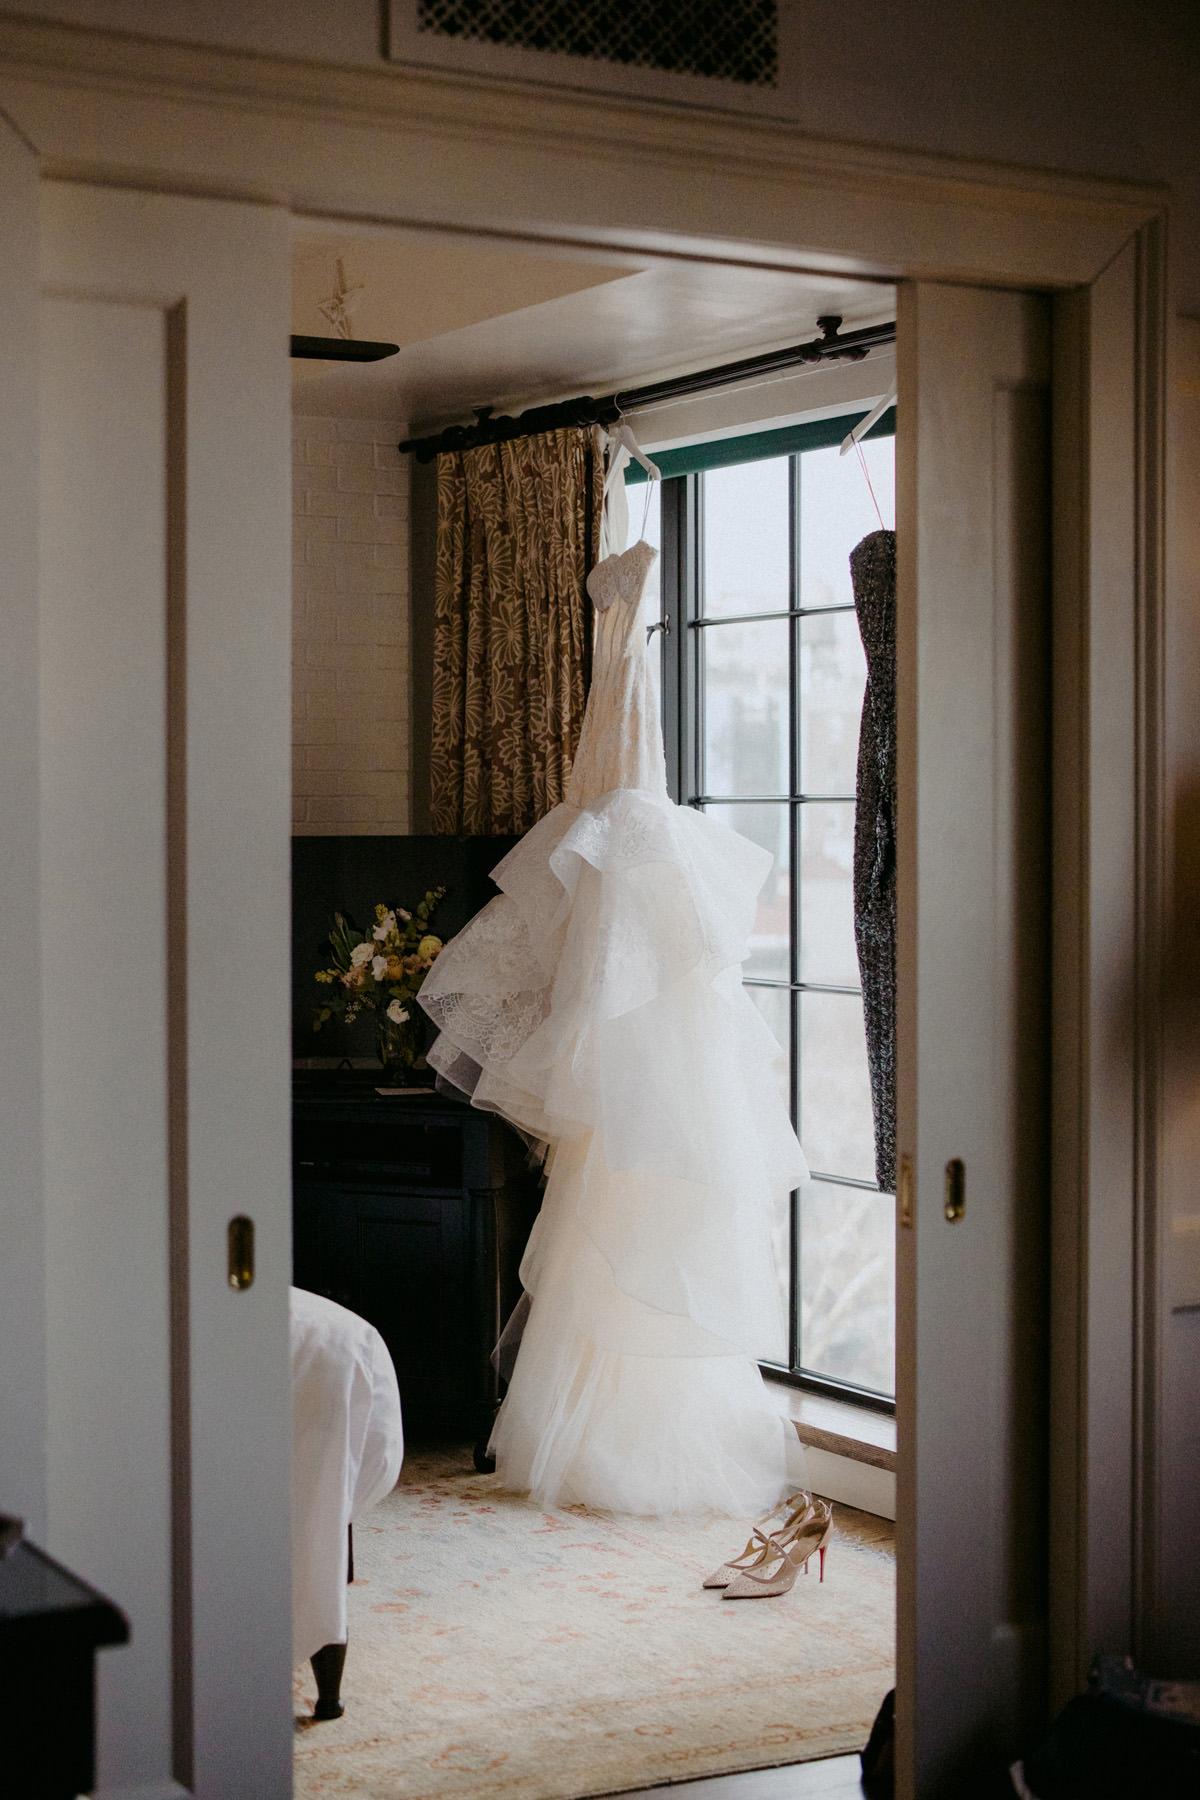 BoweryHotel_Wedding_Manhattan_NYC_SammBlakePhotographer_013.jpg